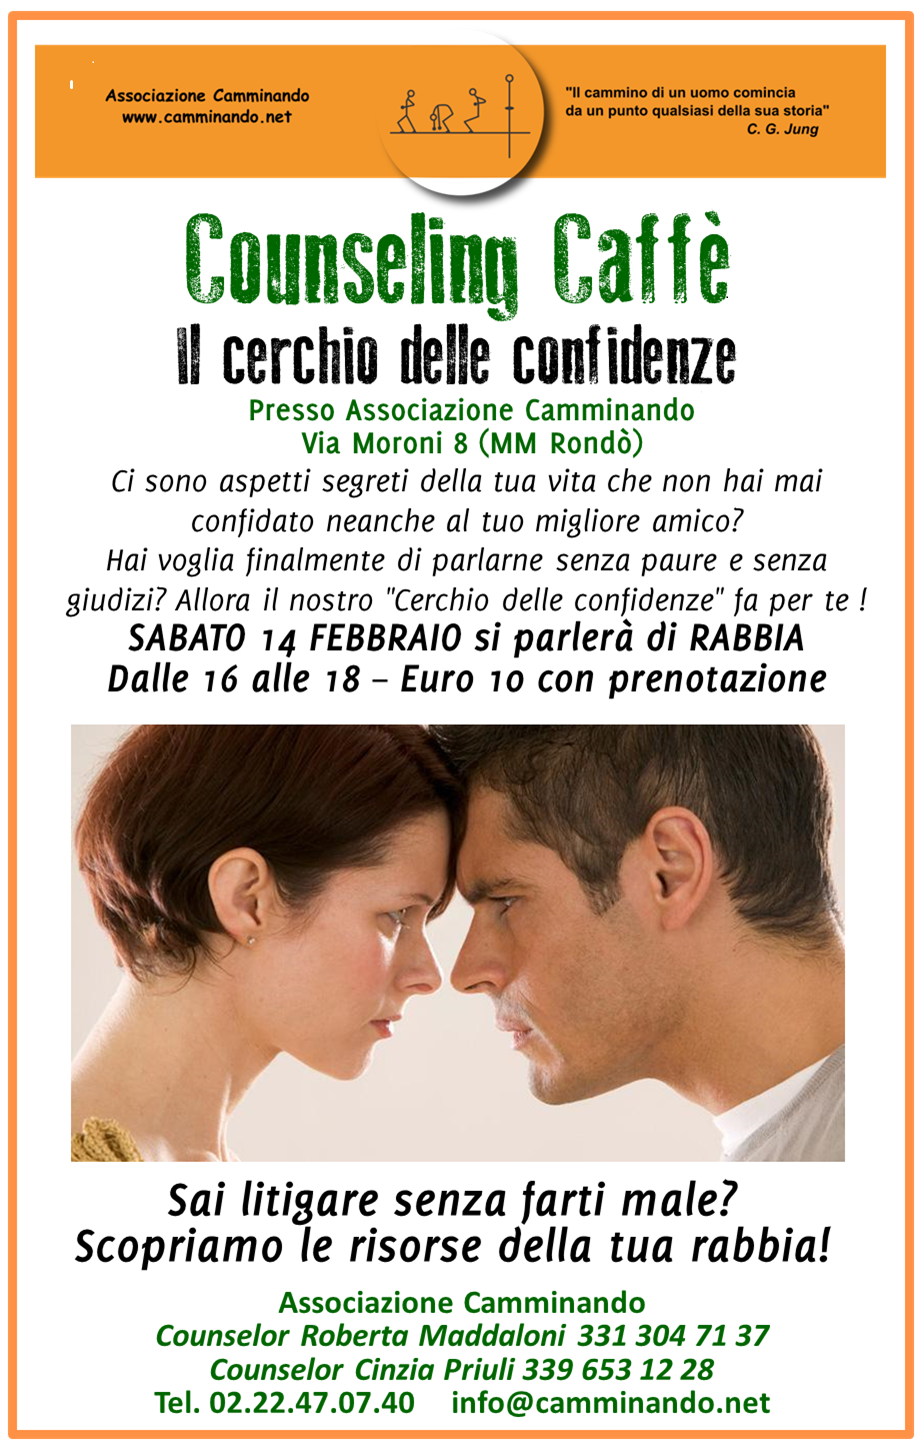 counseling caffe rabbia 14 febbraio